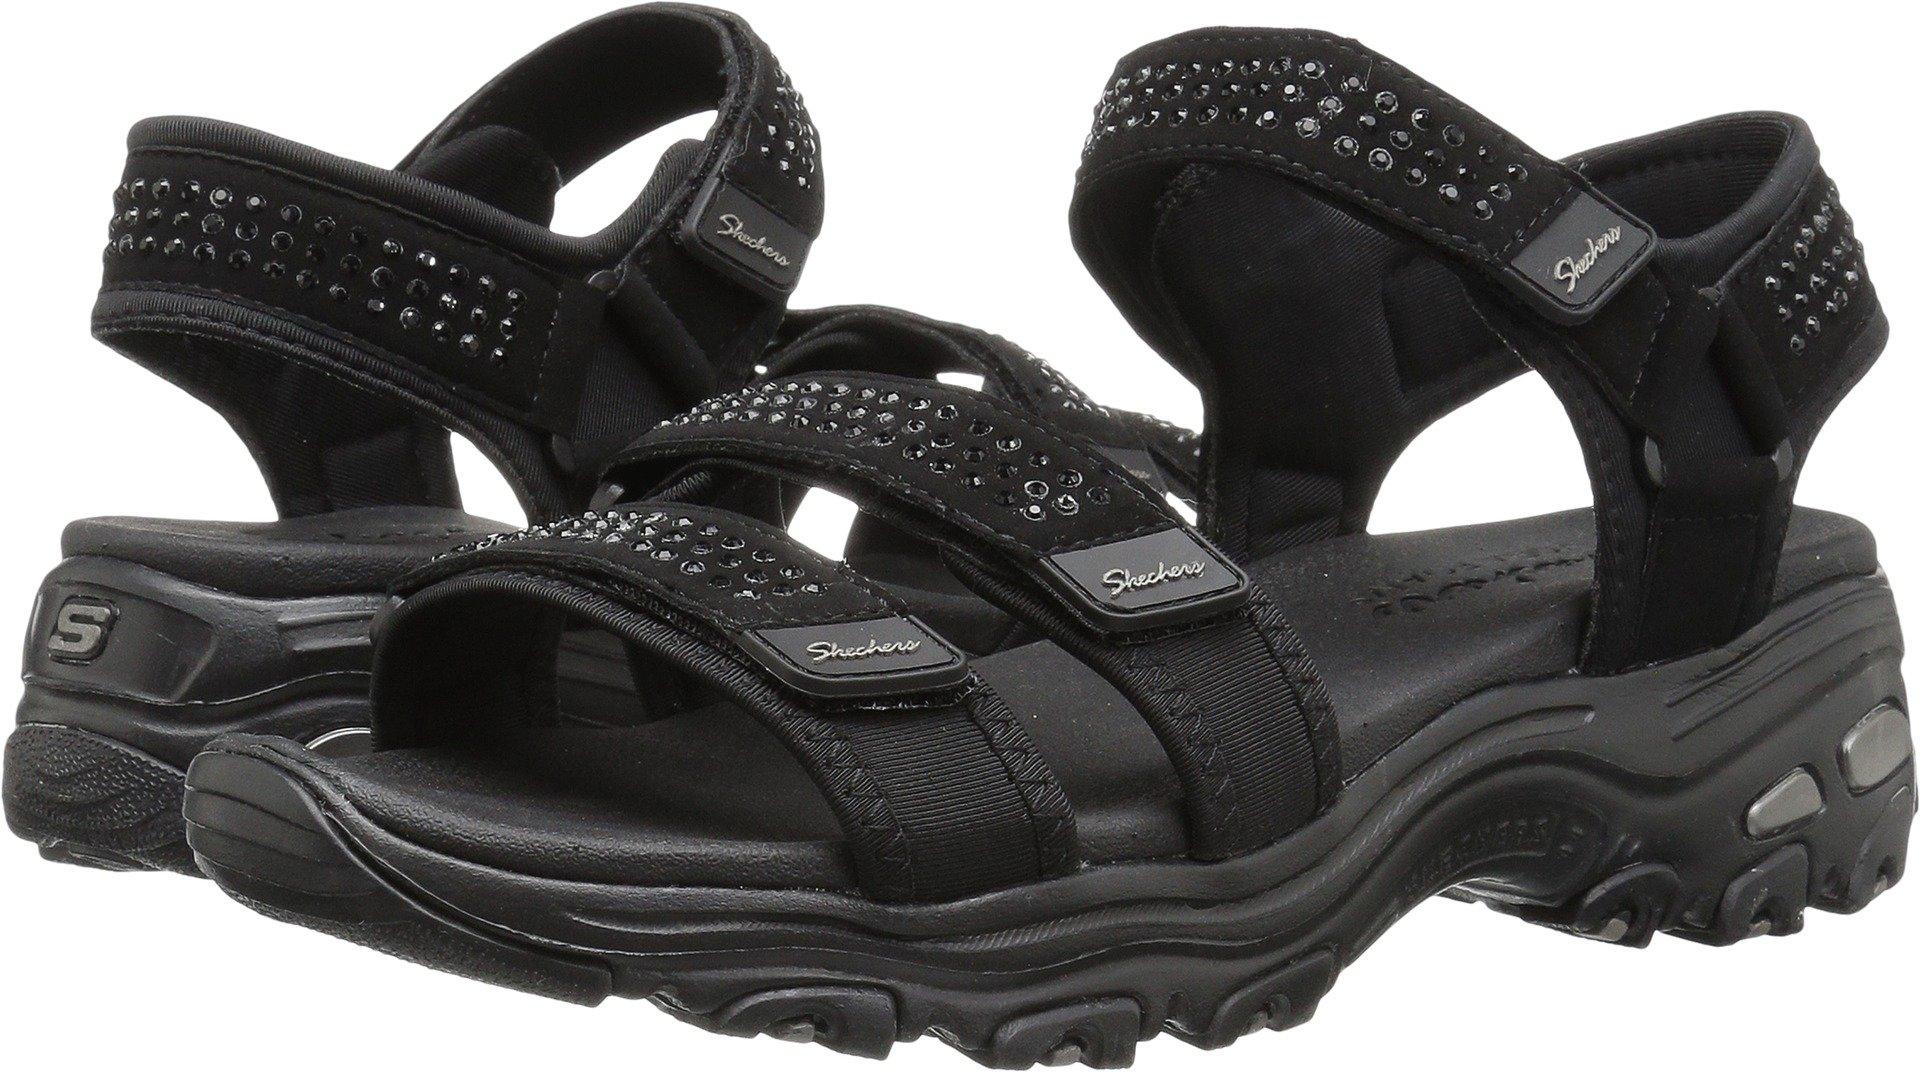 Skechers Women's D'Lites-Retro Glam-Rhinestone River Style Sporty Comfort Sport Sandal, Black/Black, 10 M US